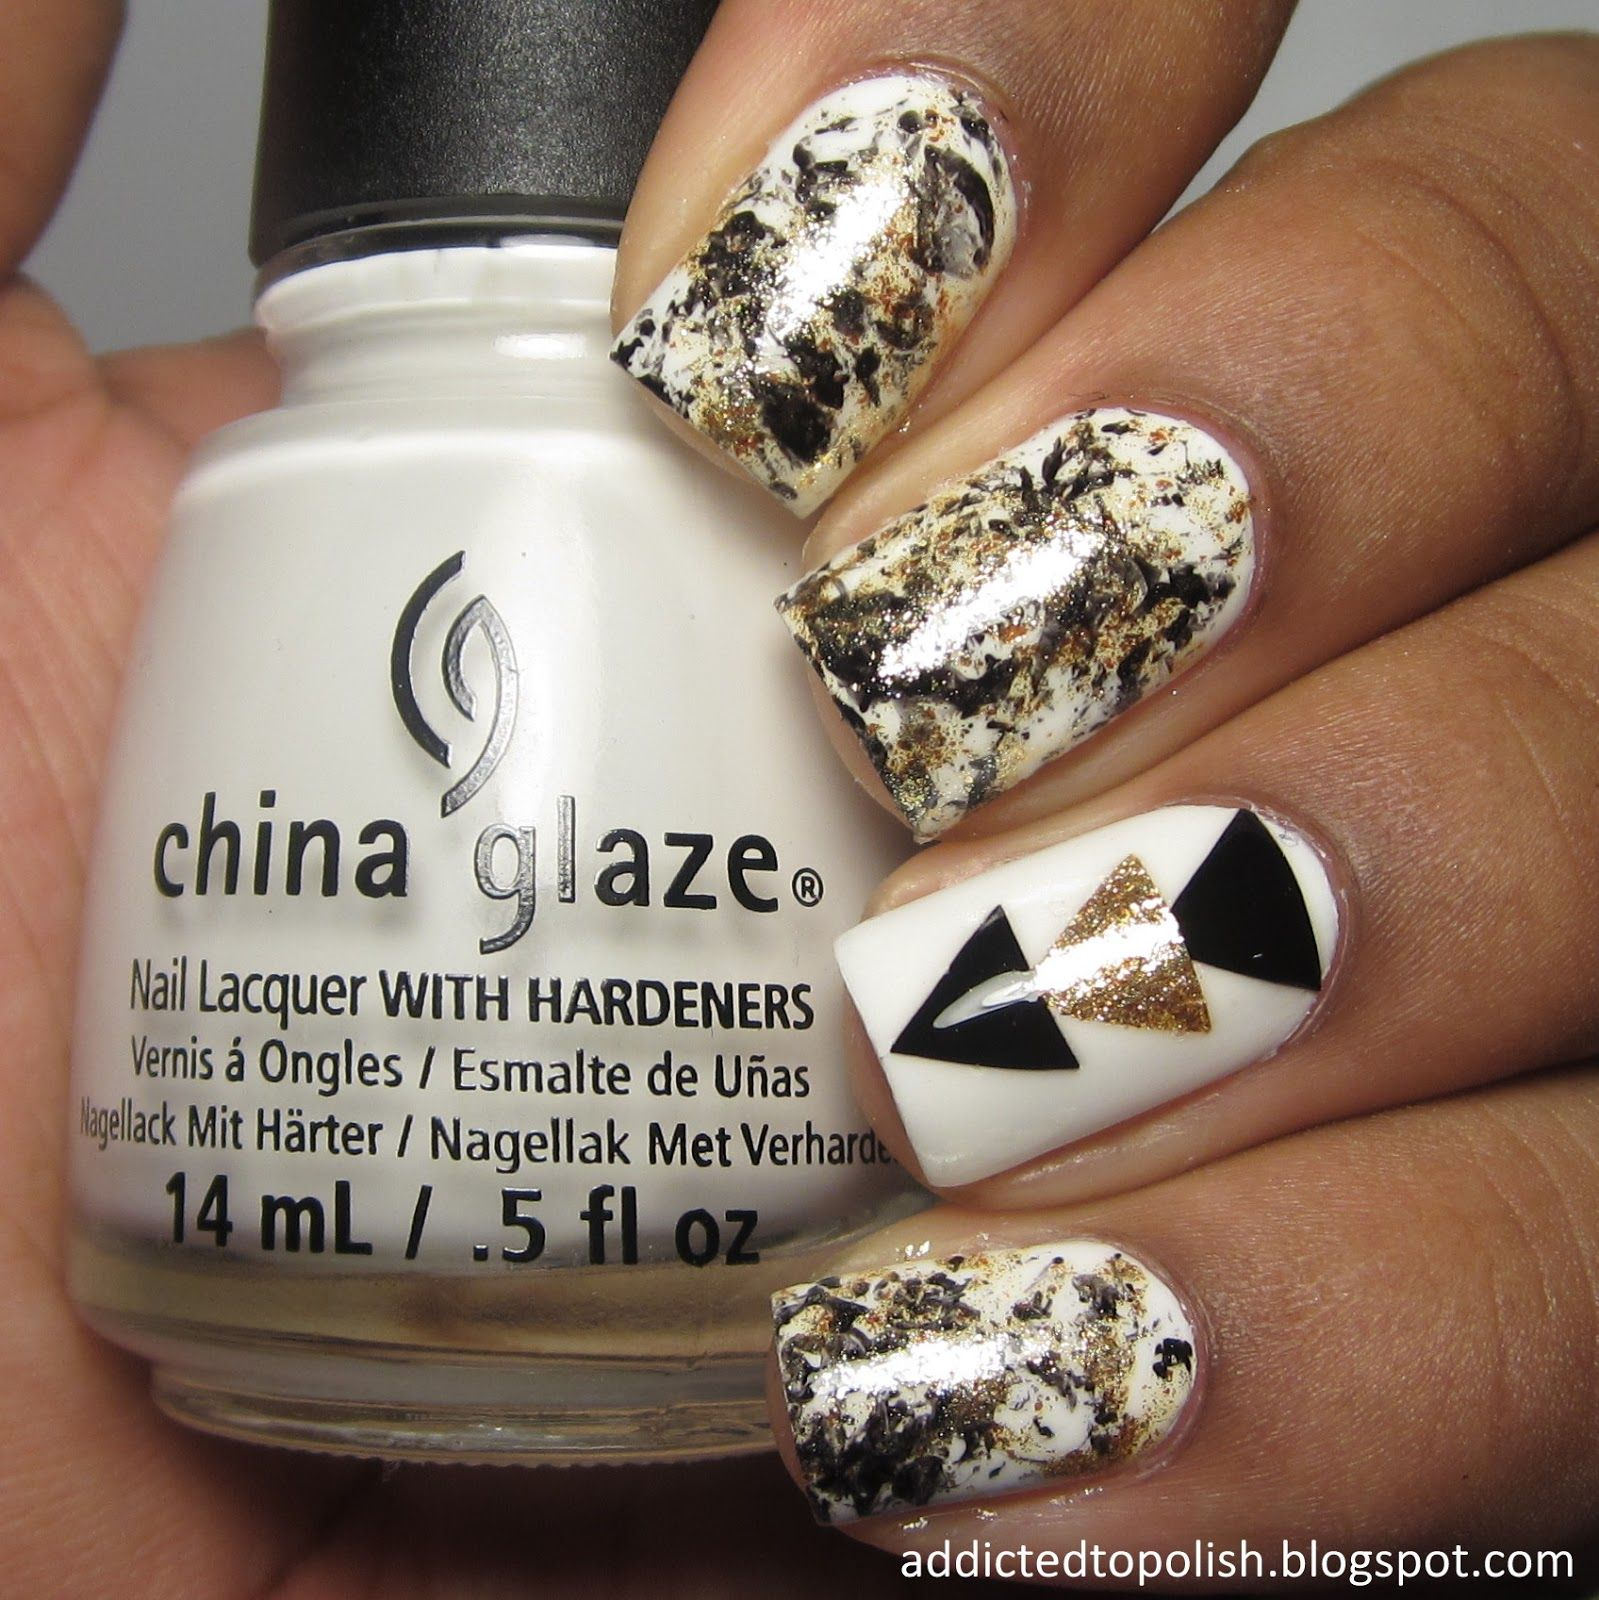 Addicted to Polish: Black, White and Gold Triangle Nail Art - Black, White And Gold Triangle Nail Art (Addicted To Polish